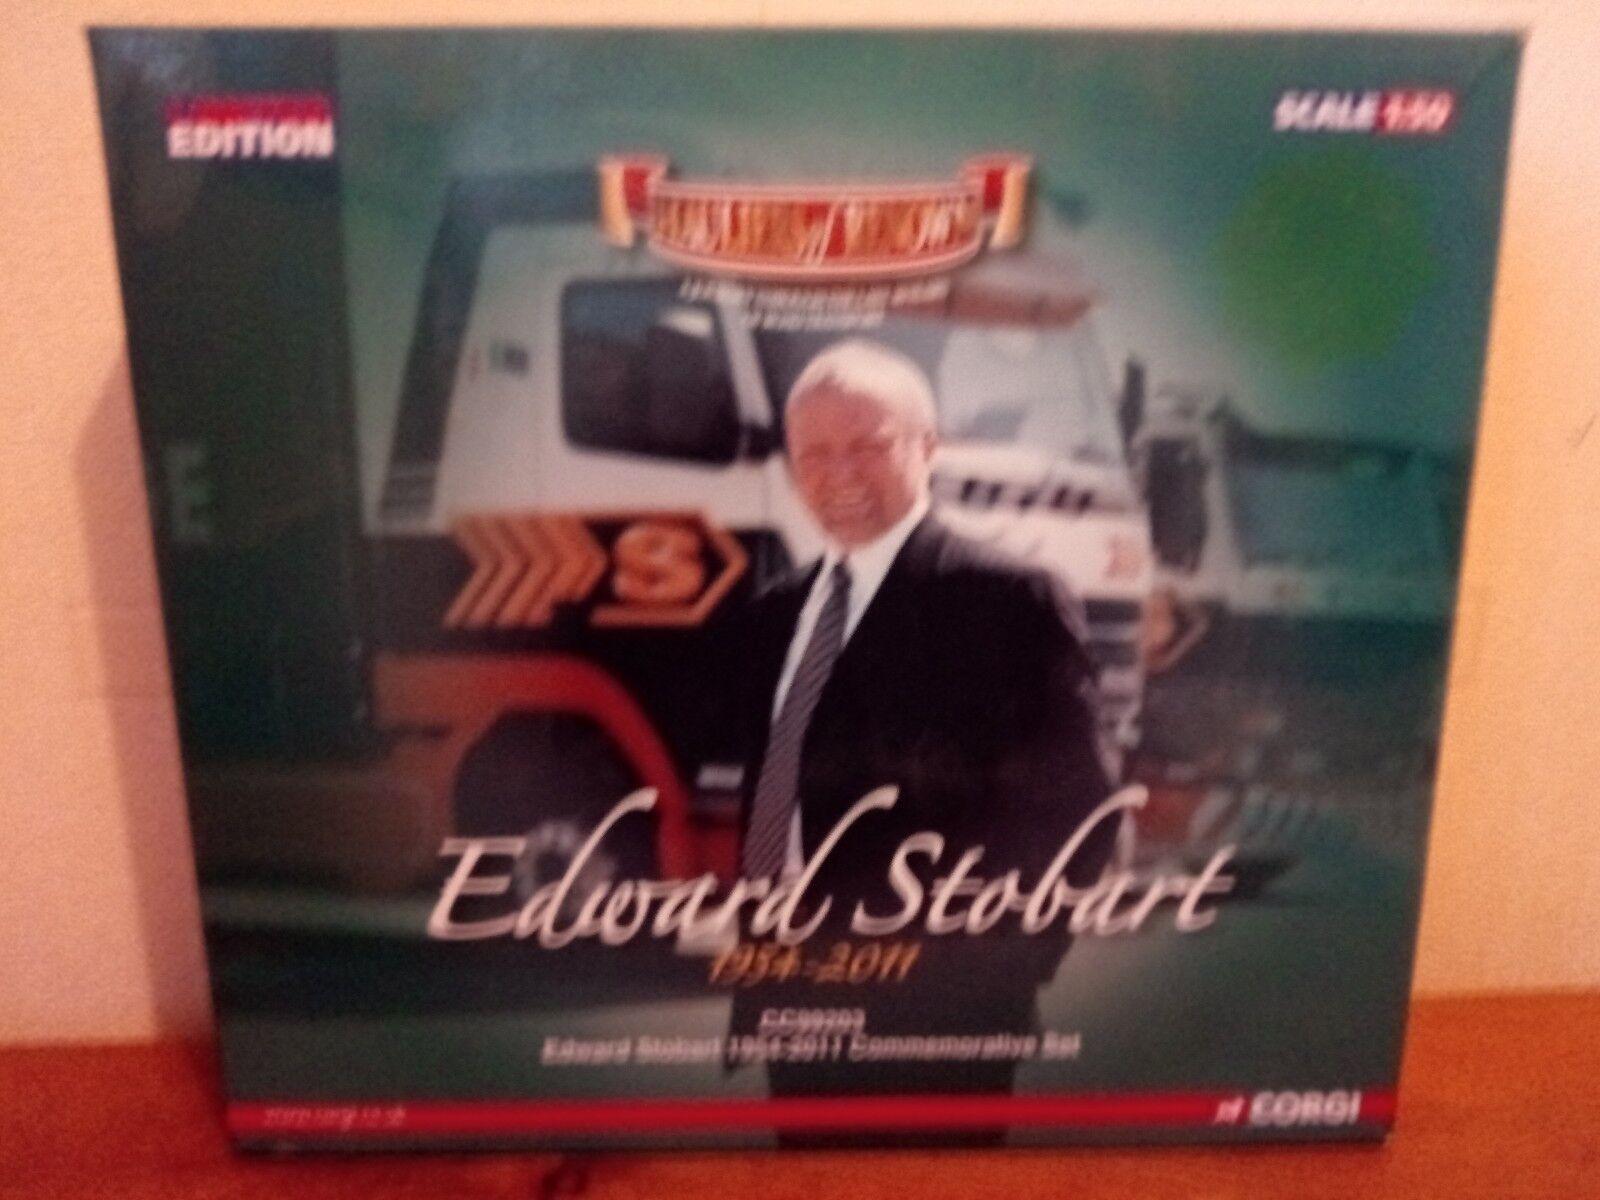 CORGI CC99203 Edward Stobart Set